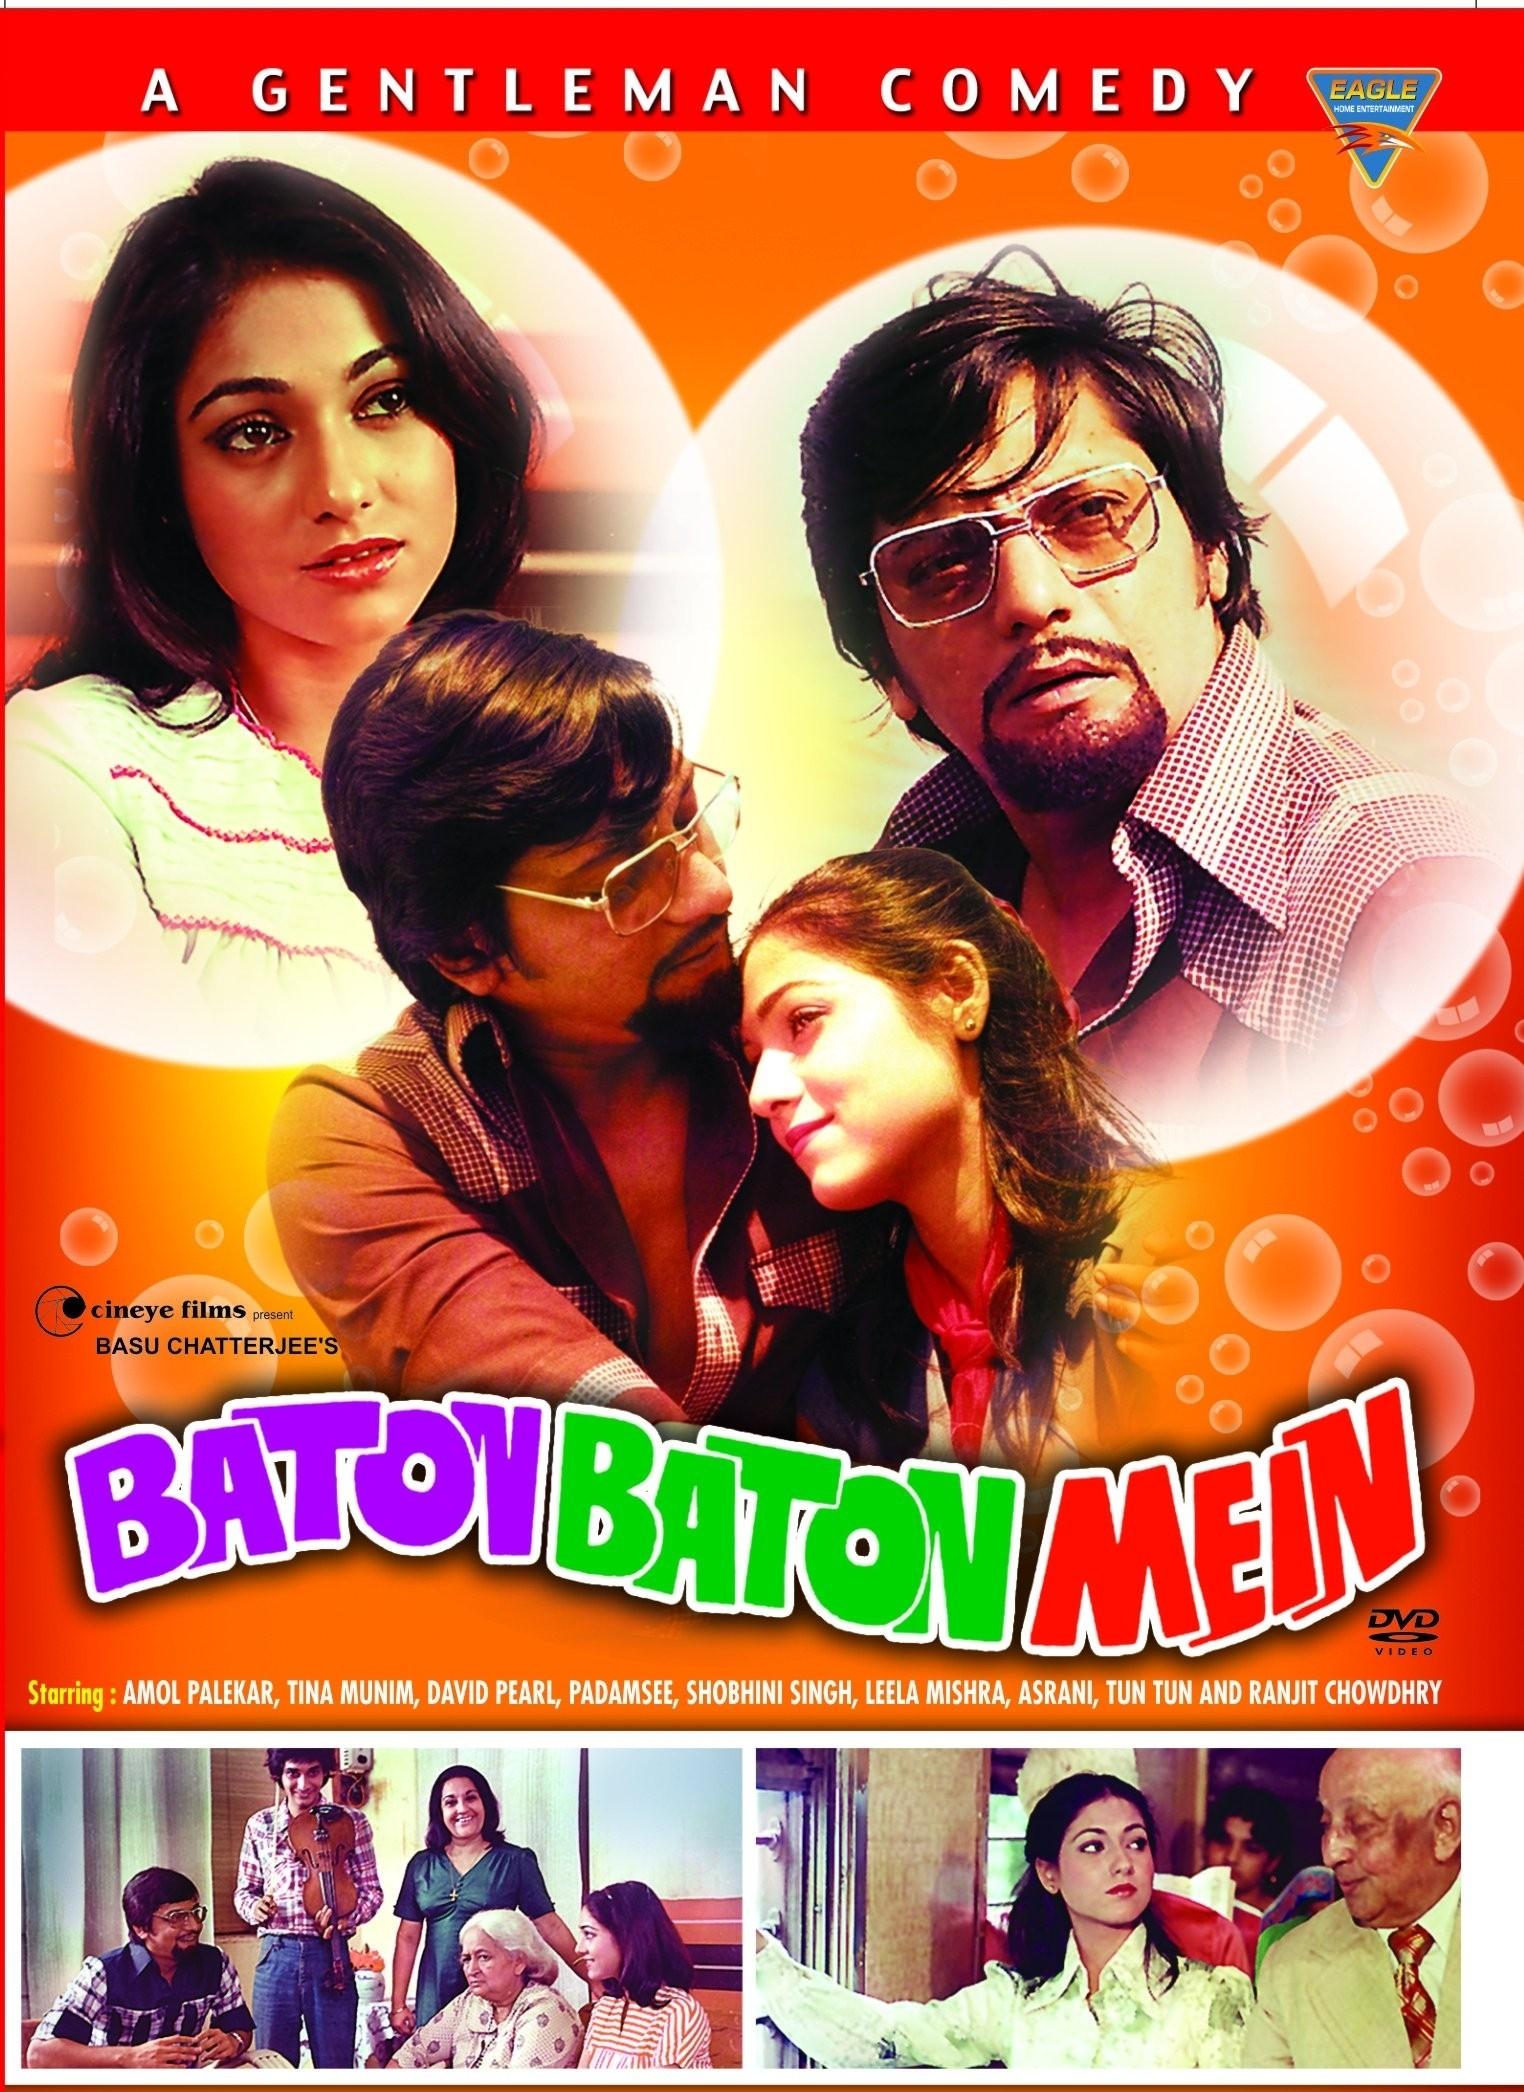 Baton Baton Mein (1979) - IMDb